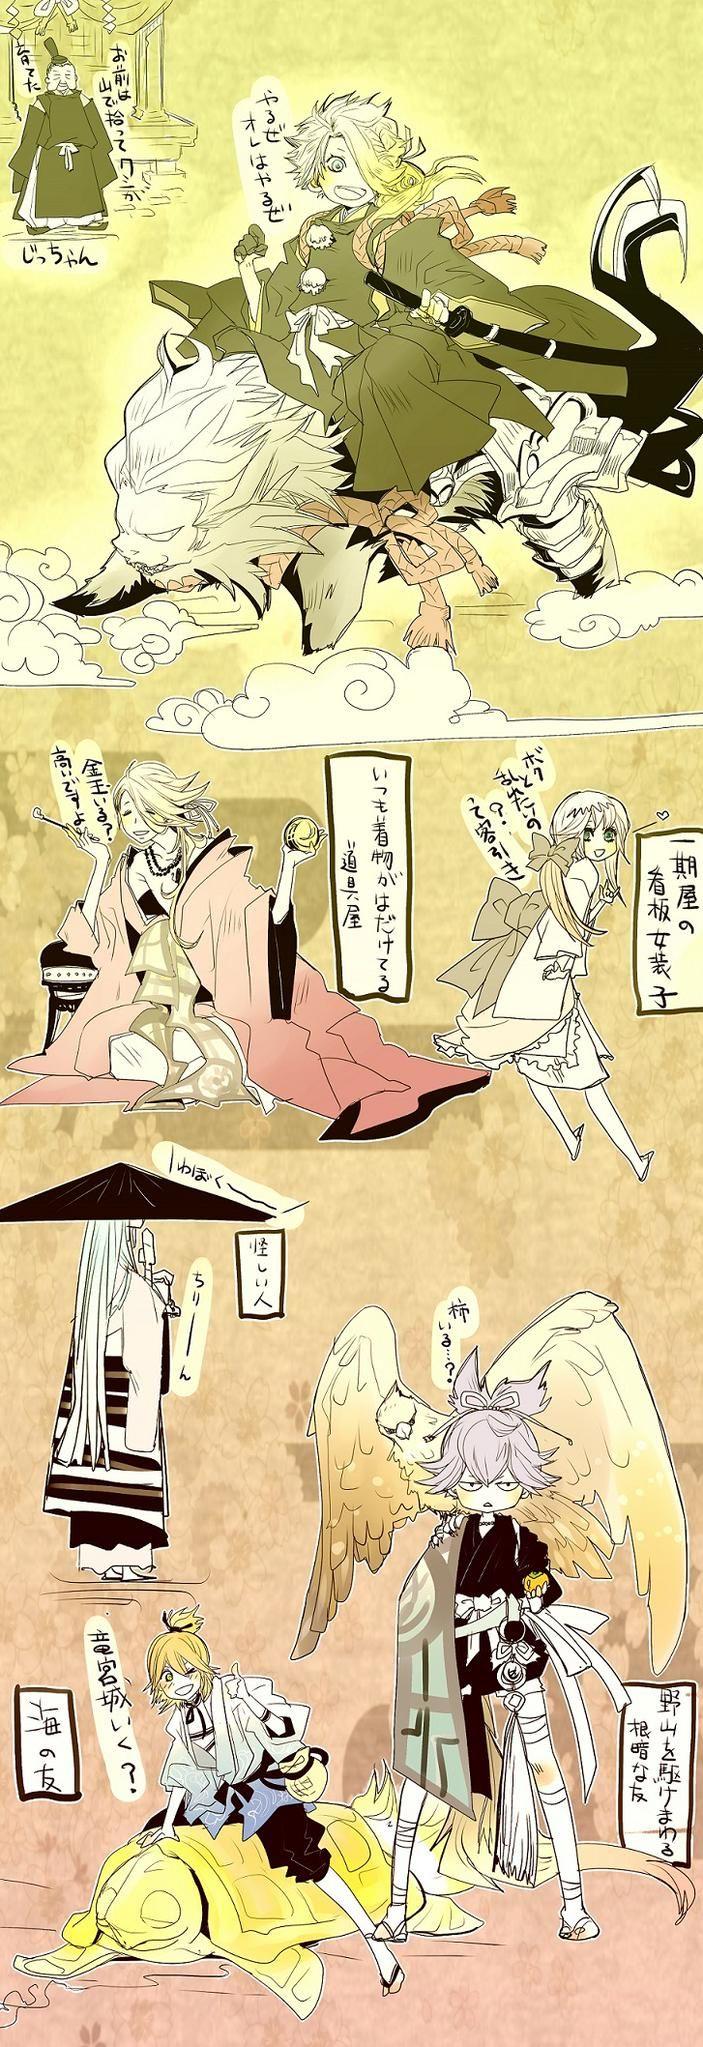 Touken Ranbu cartoons   刀剣男子で考え出したら止まらなくなってしまったんだ。平安ファンタジーもどき